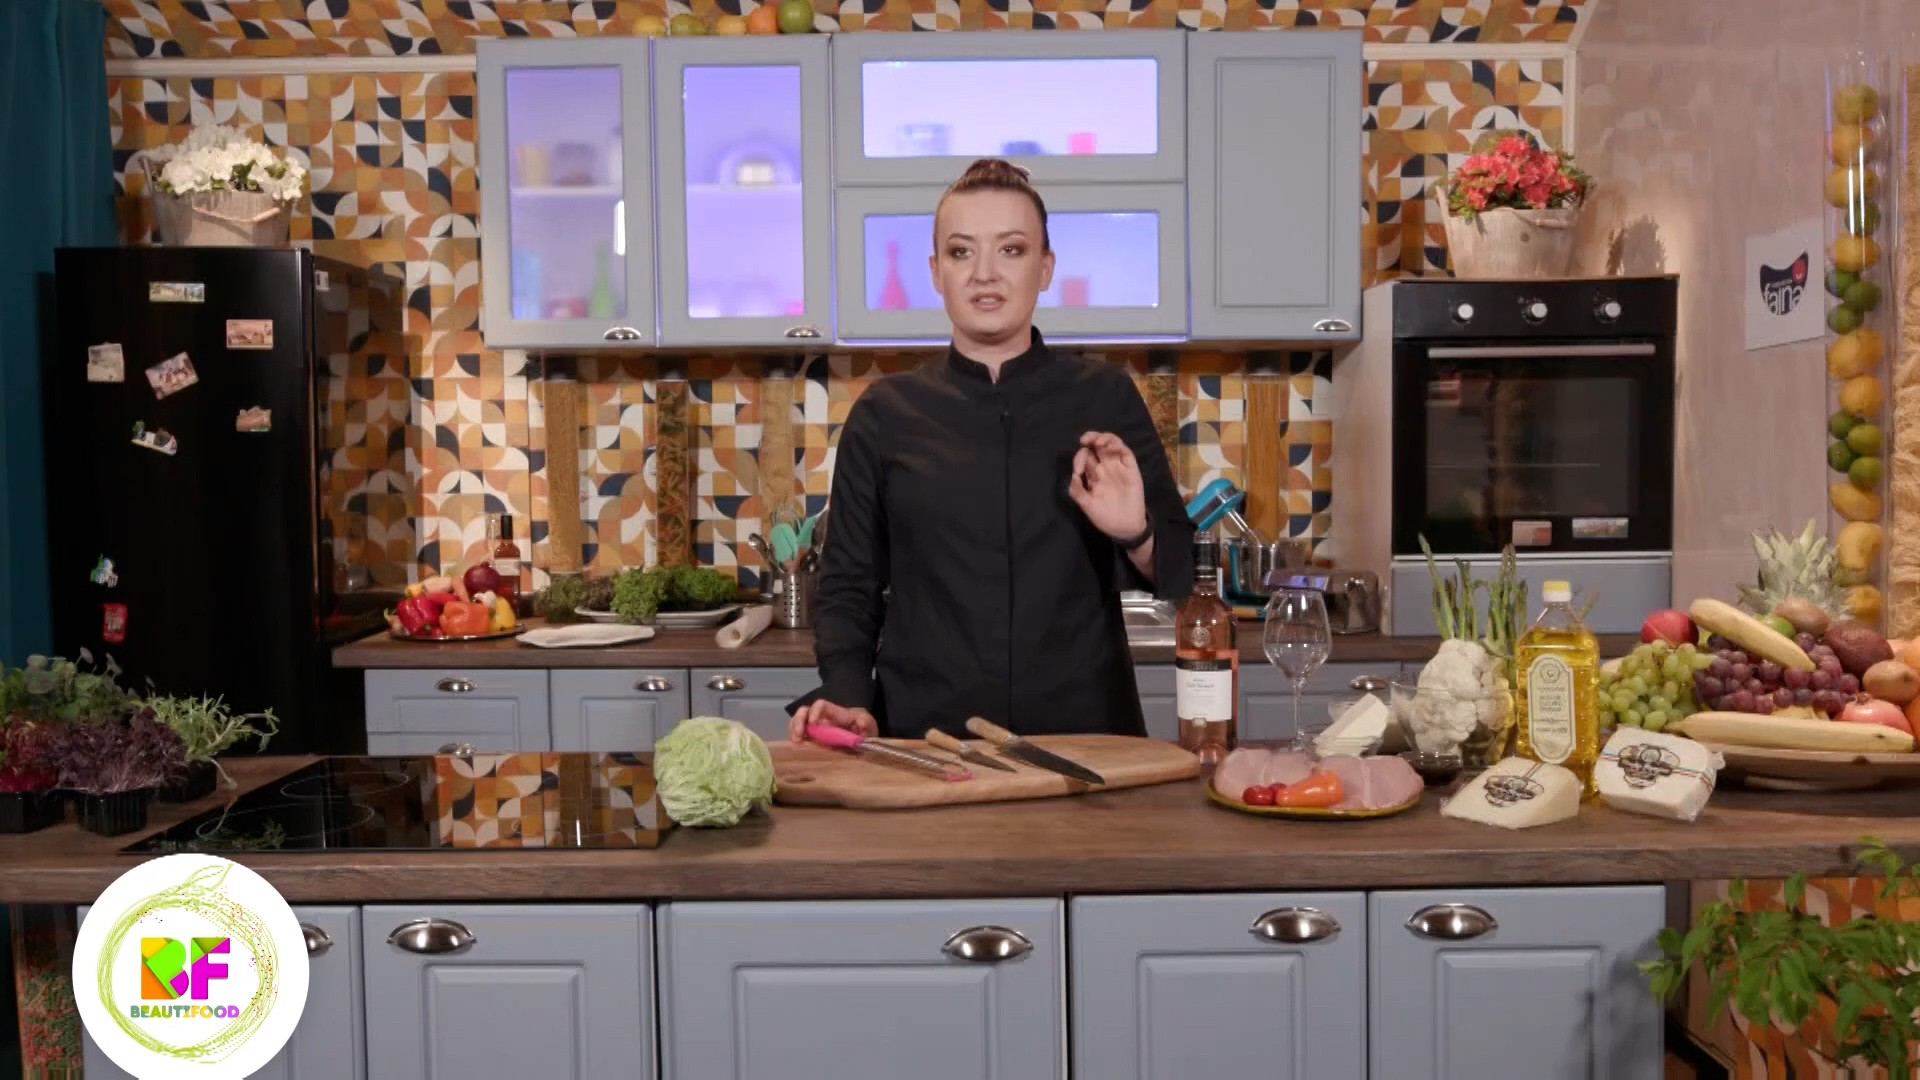 BeautiFood, episodul 10, 8 august 2021. Roxana Blenche a pregătit piept de pui cu sparanghel